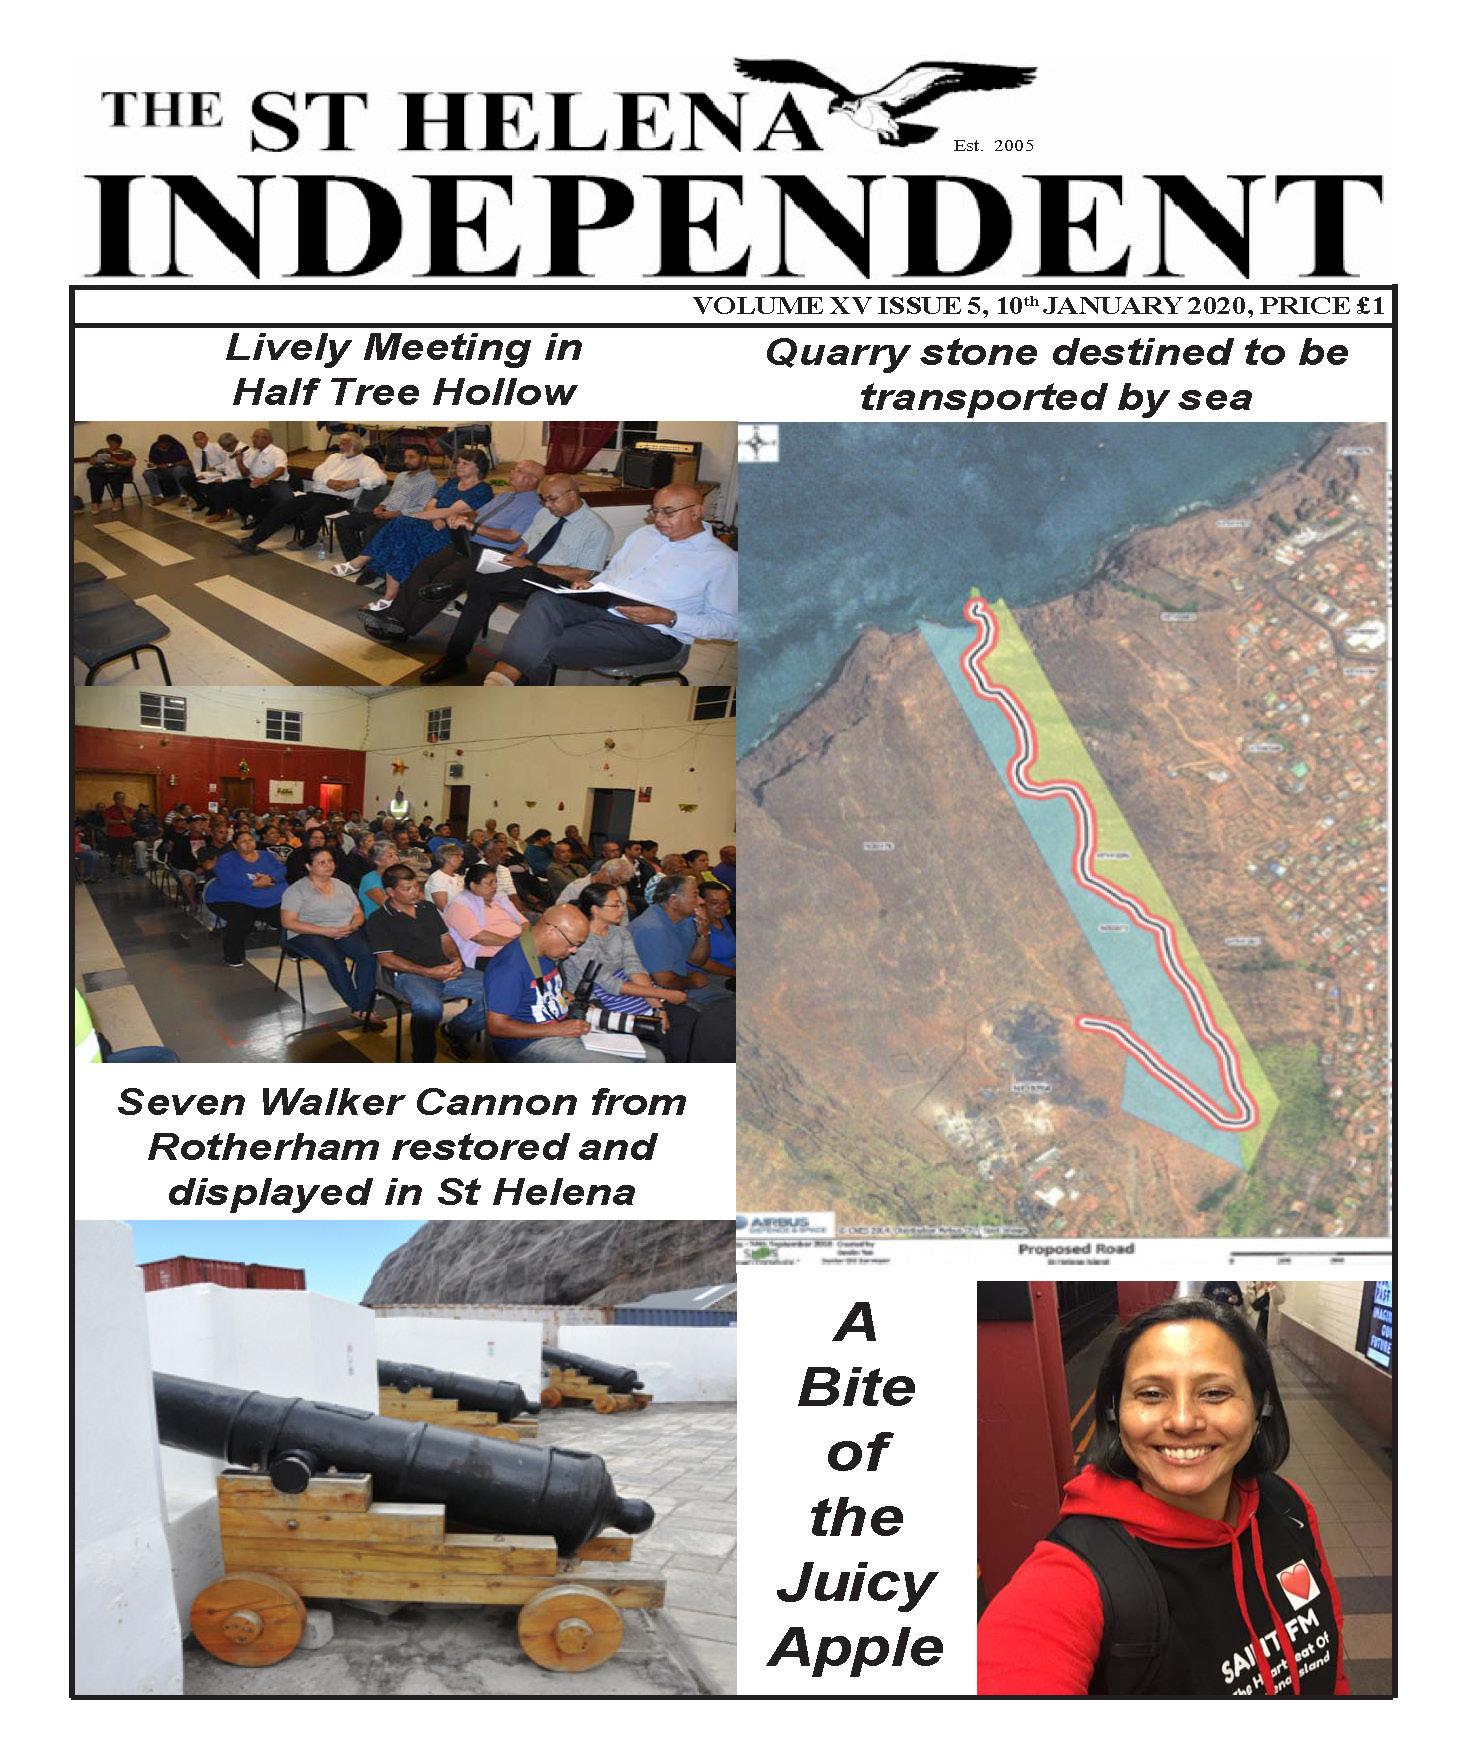 St Helena Independent 20200110